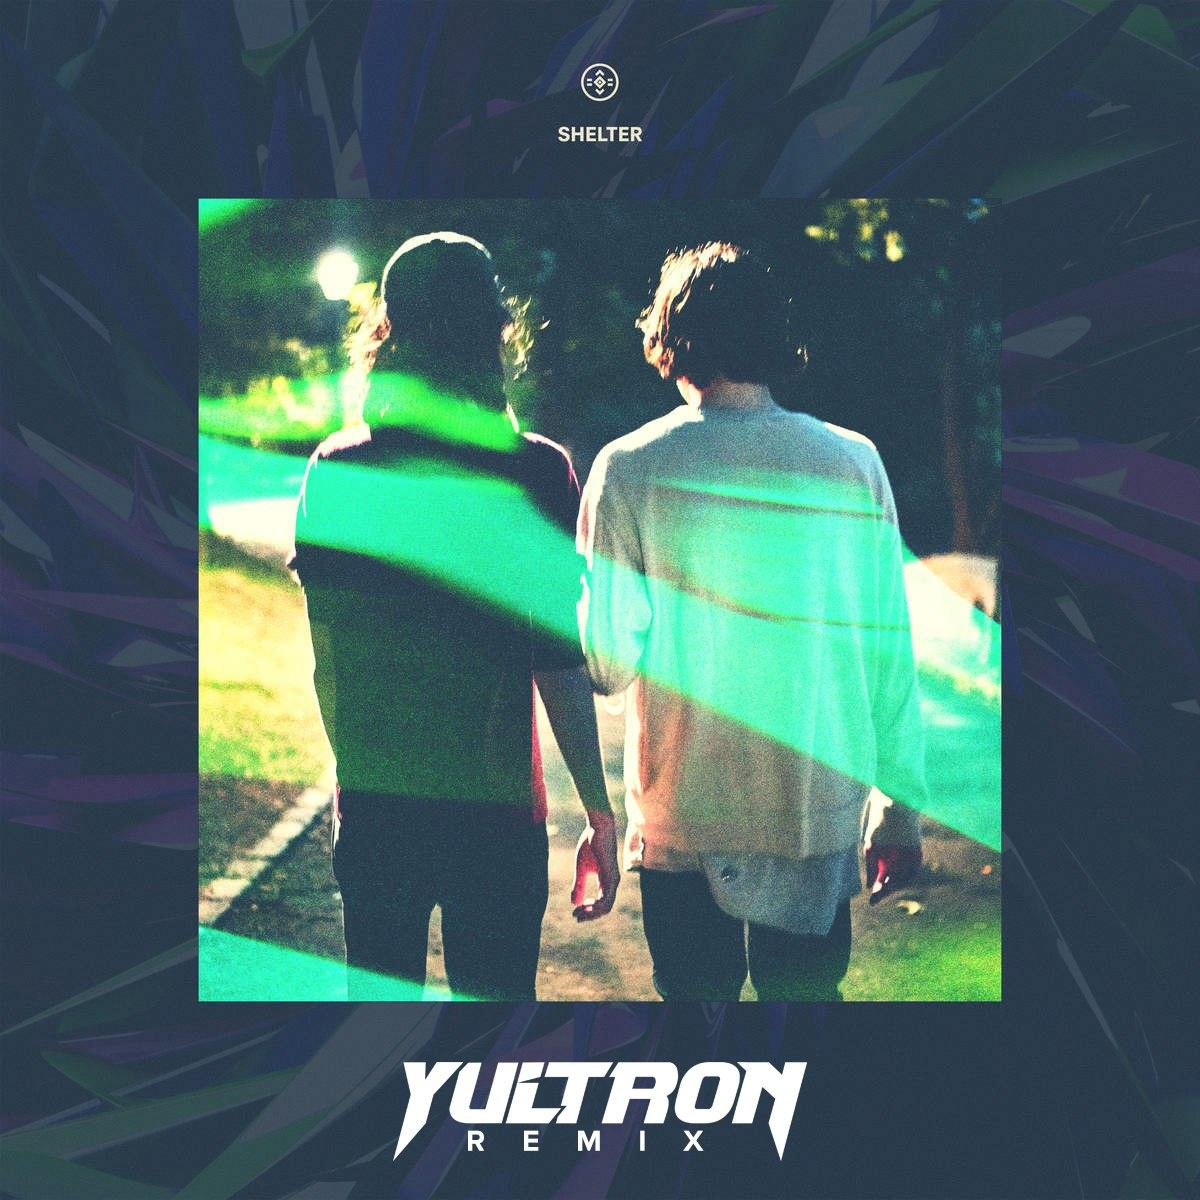 Shelter (YULTRON Remix)